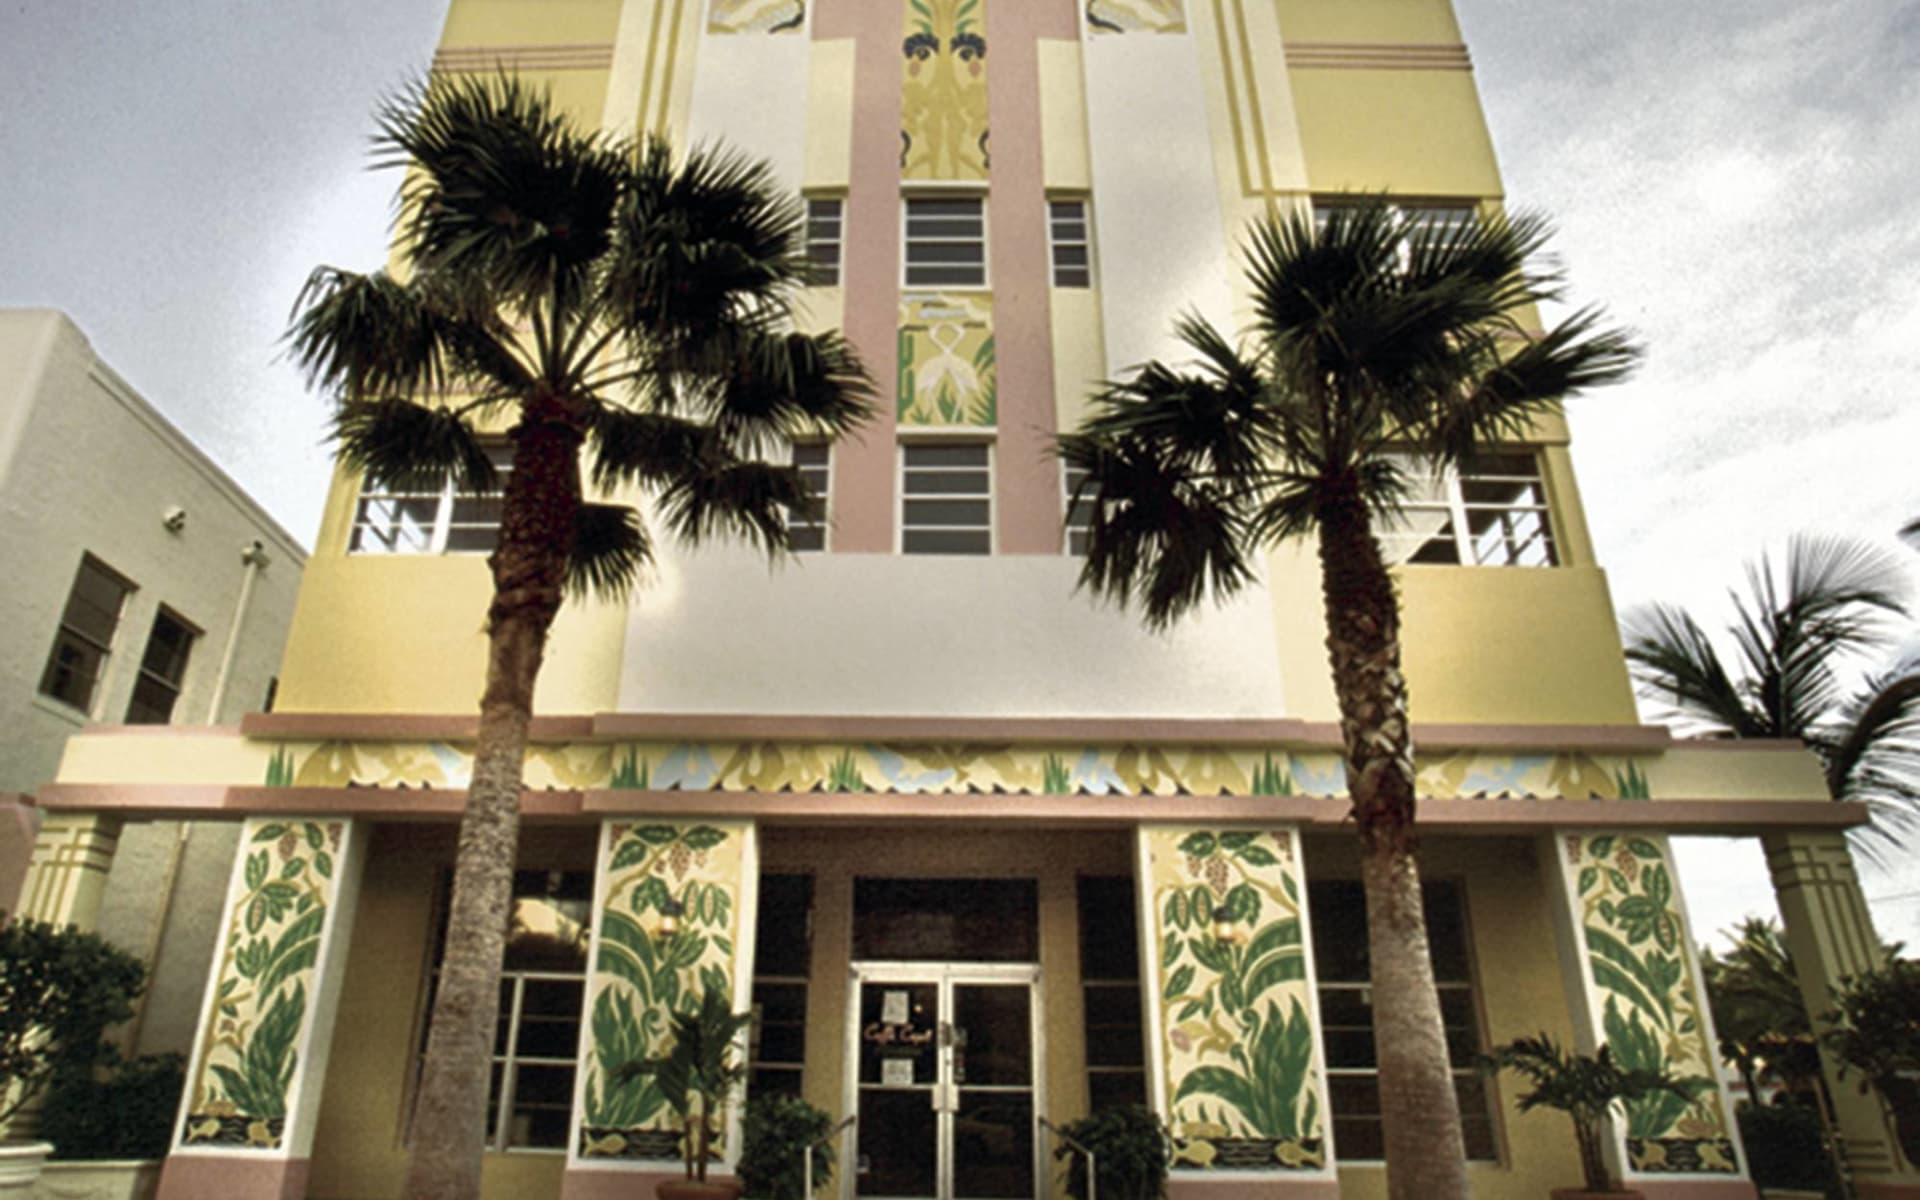 Ocean Five Hotel in Miami Beach:  Ocean Five - Hoteleingang mit Palmen